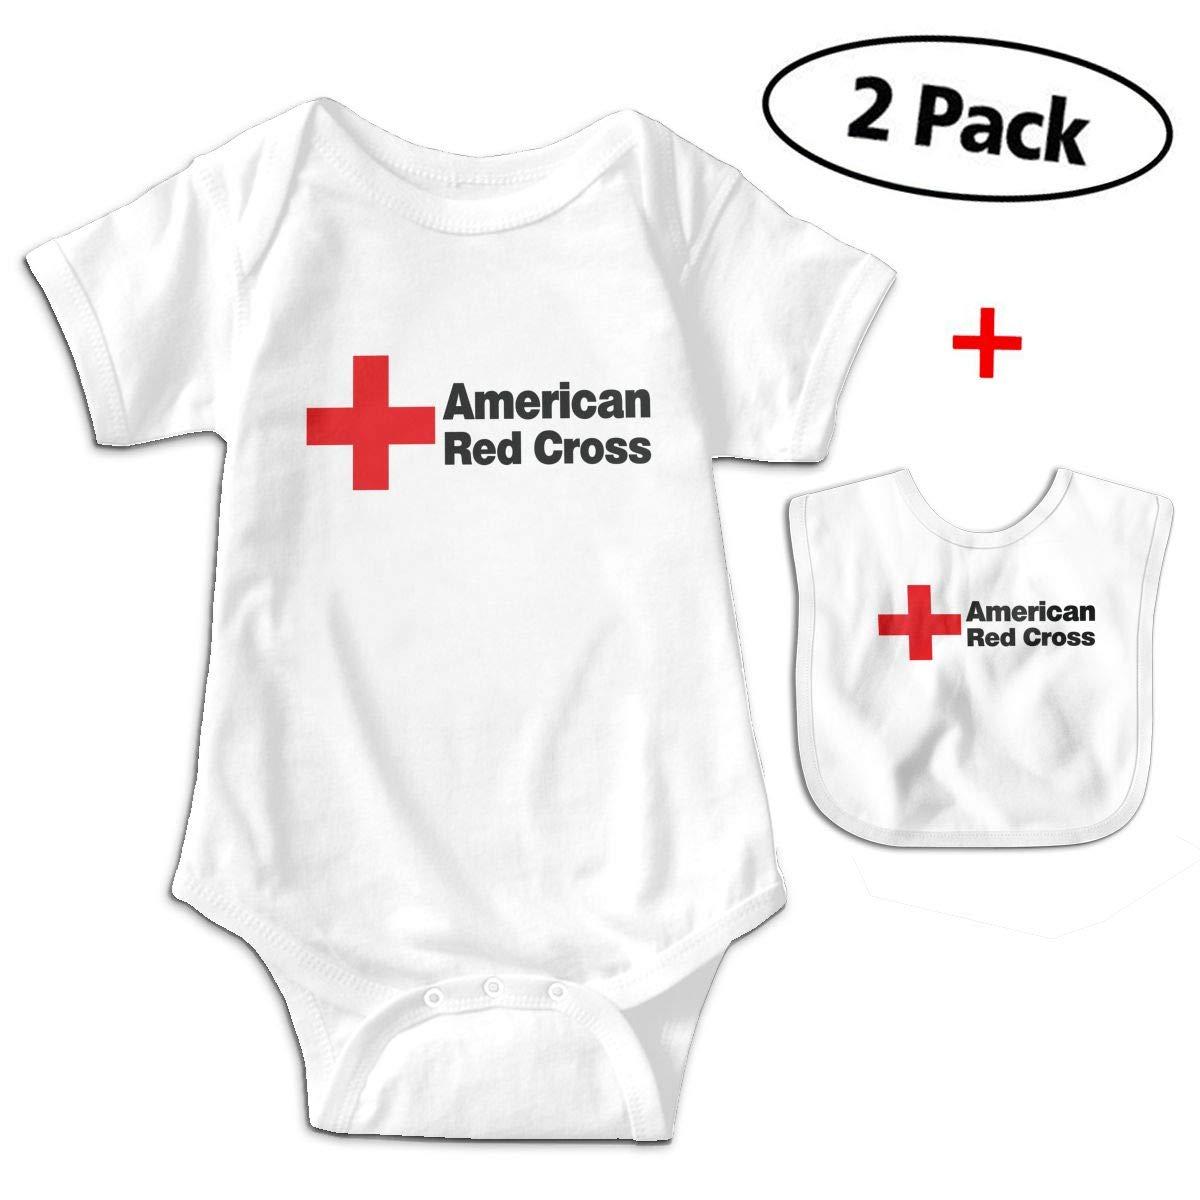 Amazon com: Wadeworth American Red Cross Baby Boys Girls 100